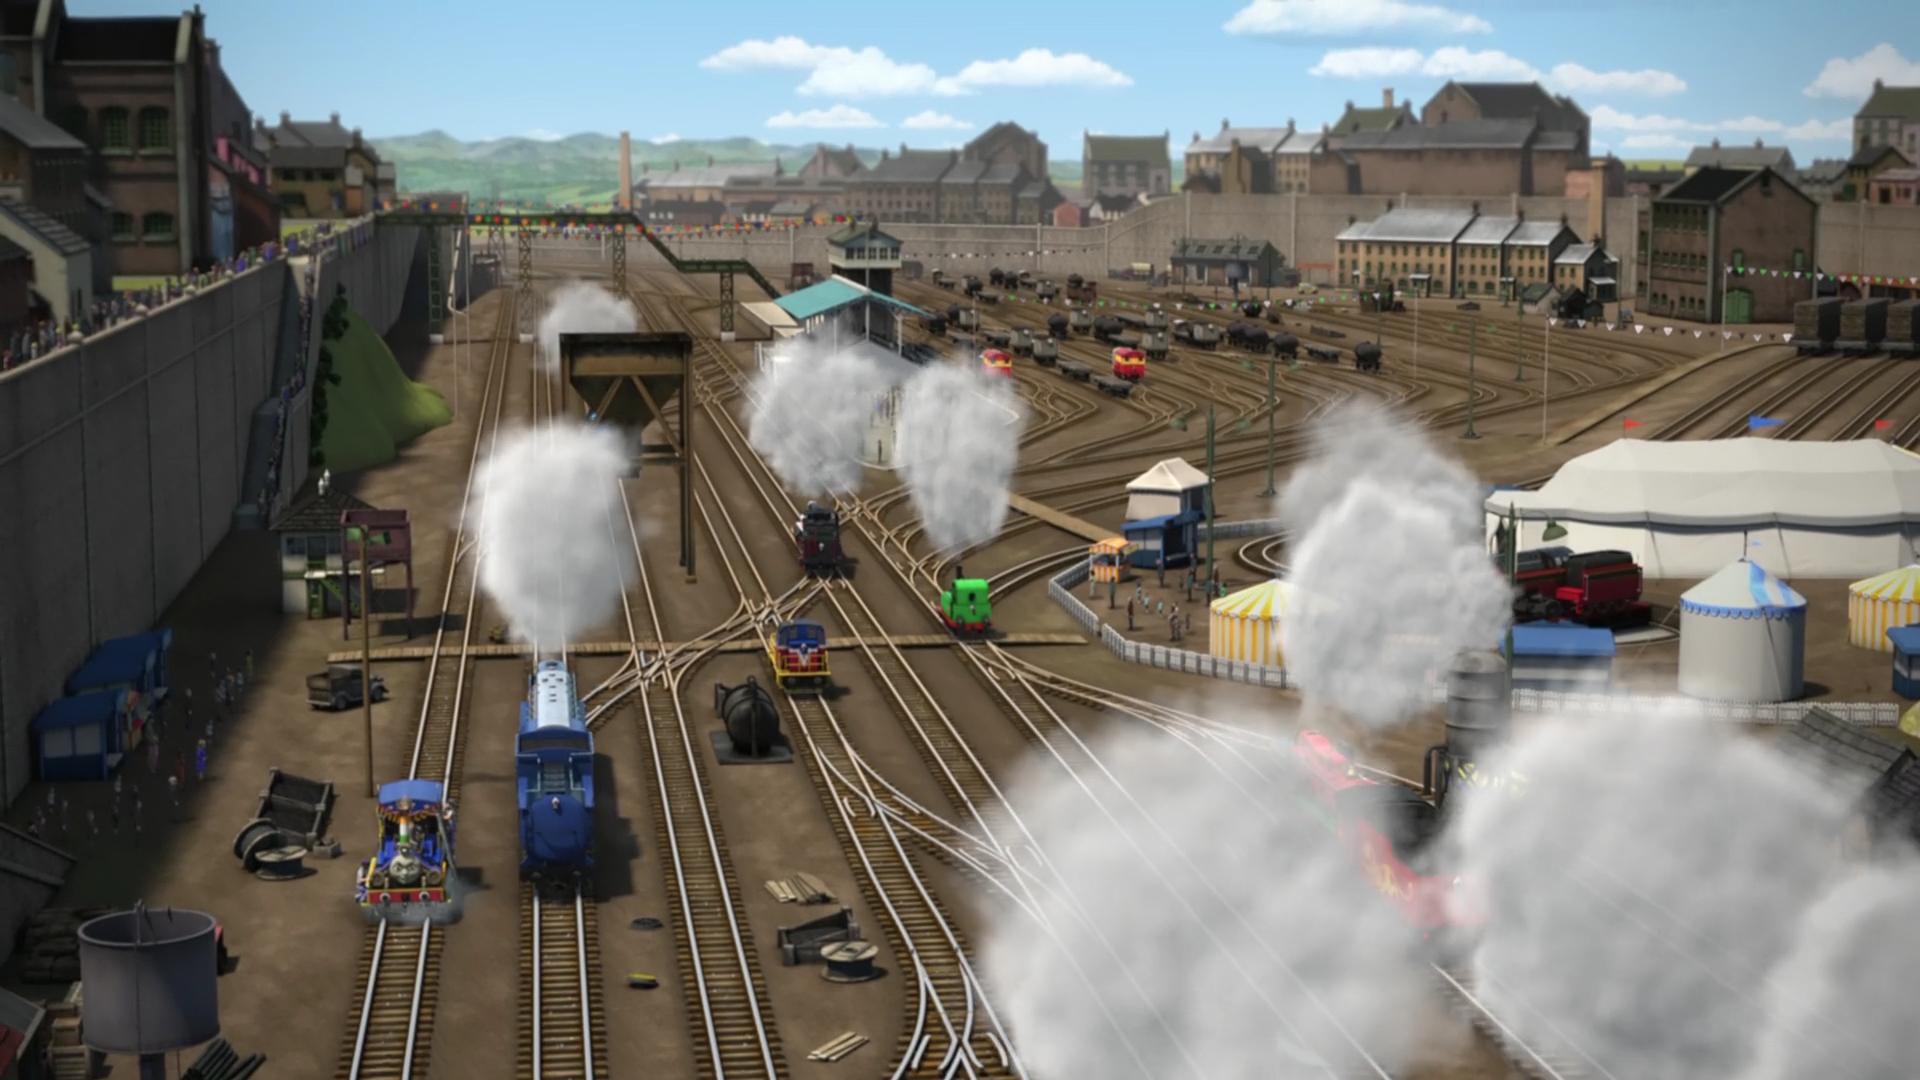 The Great Railway Show Yard